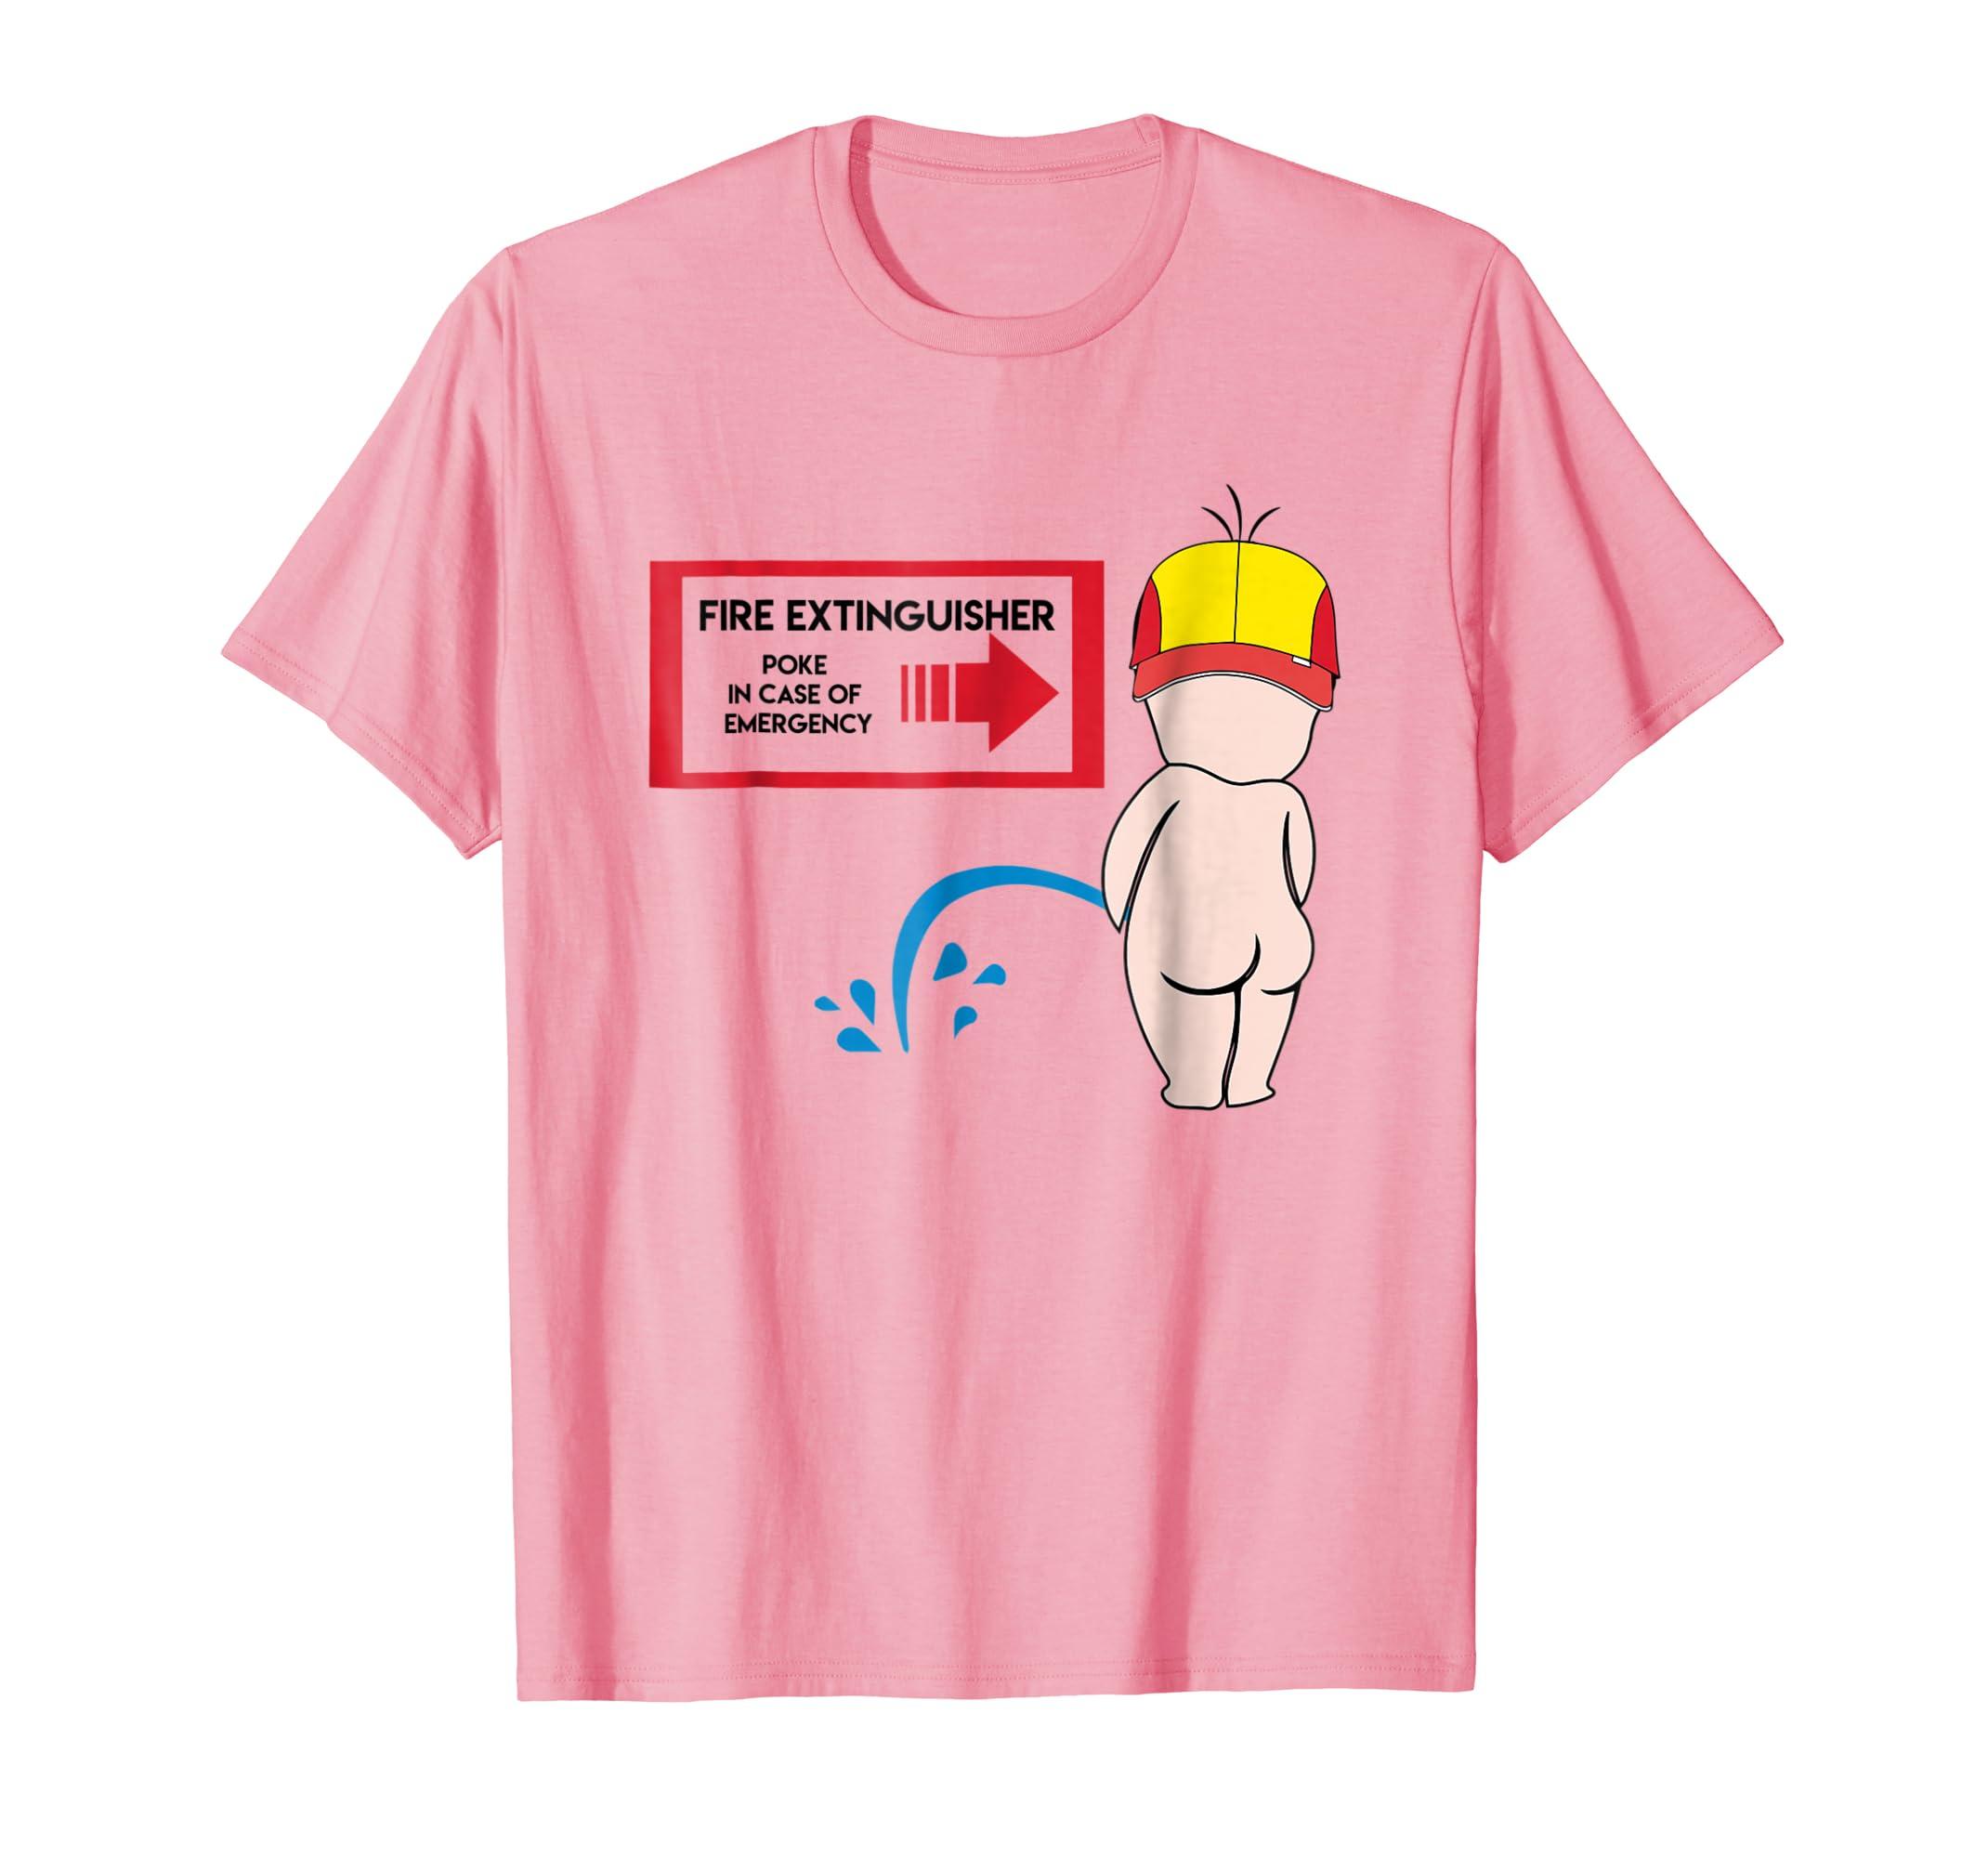 8842fbf0 Funny Baby Girl Men's Clothing - CafePress